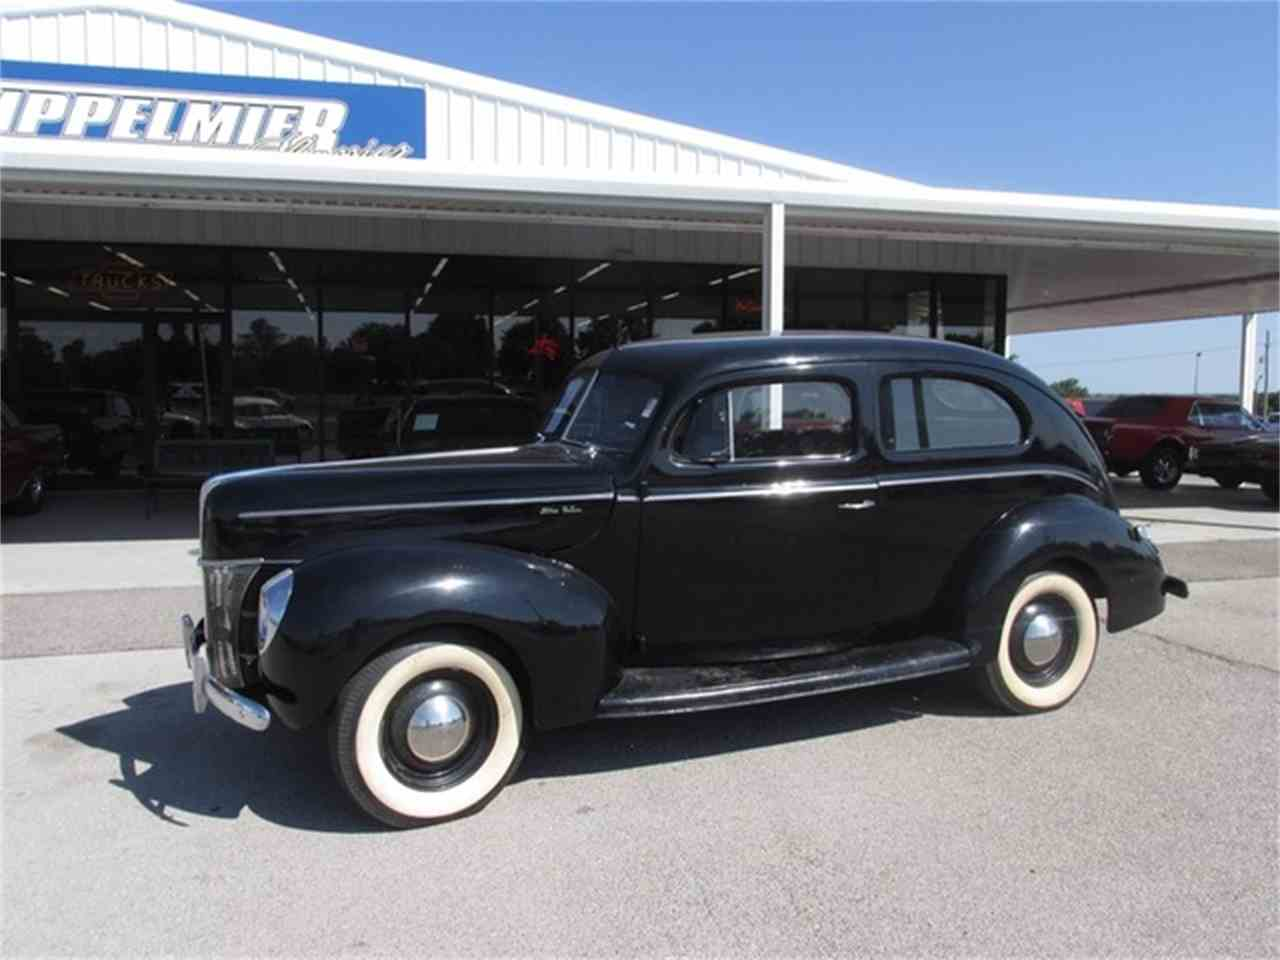 Gresham Ford Used Car Inventory